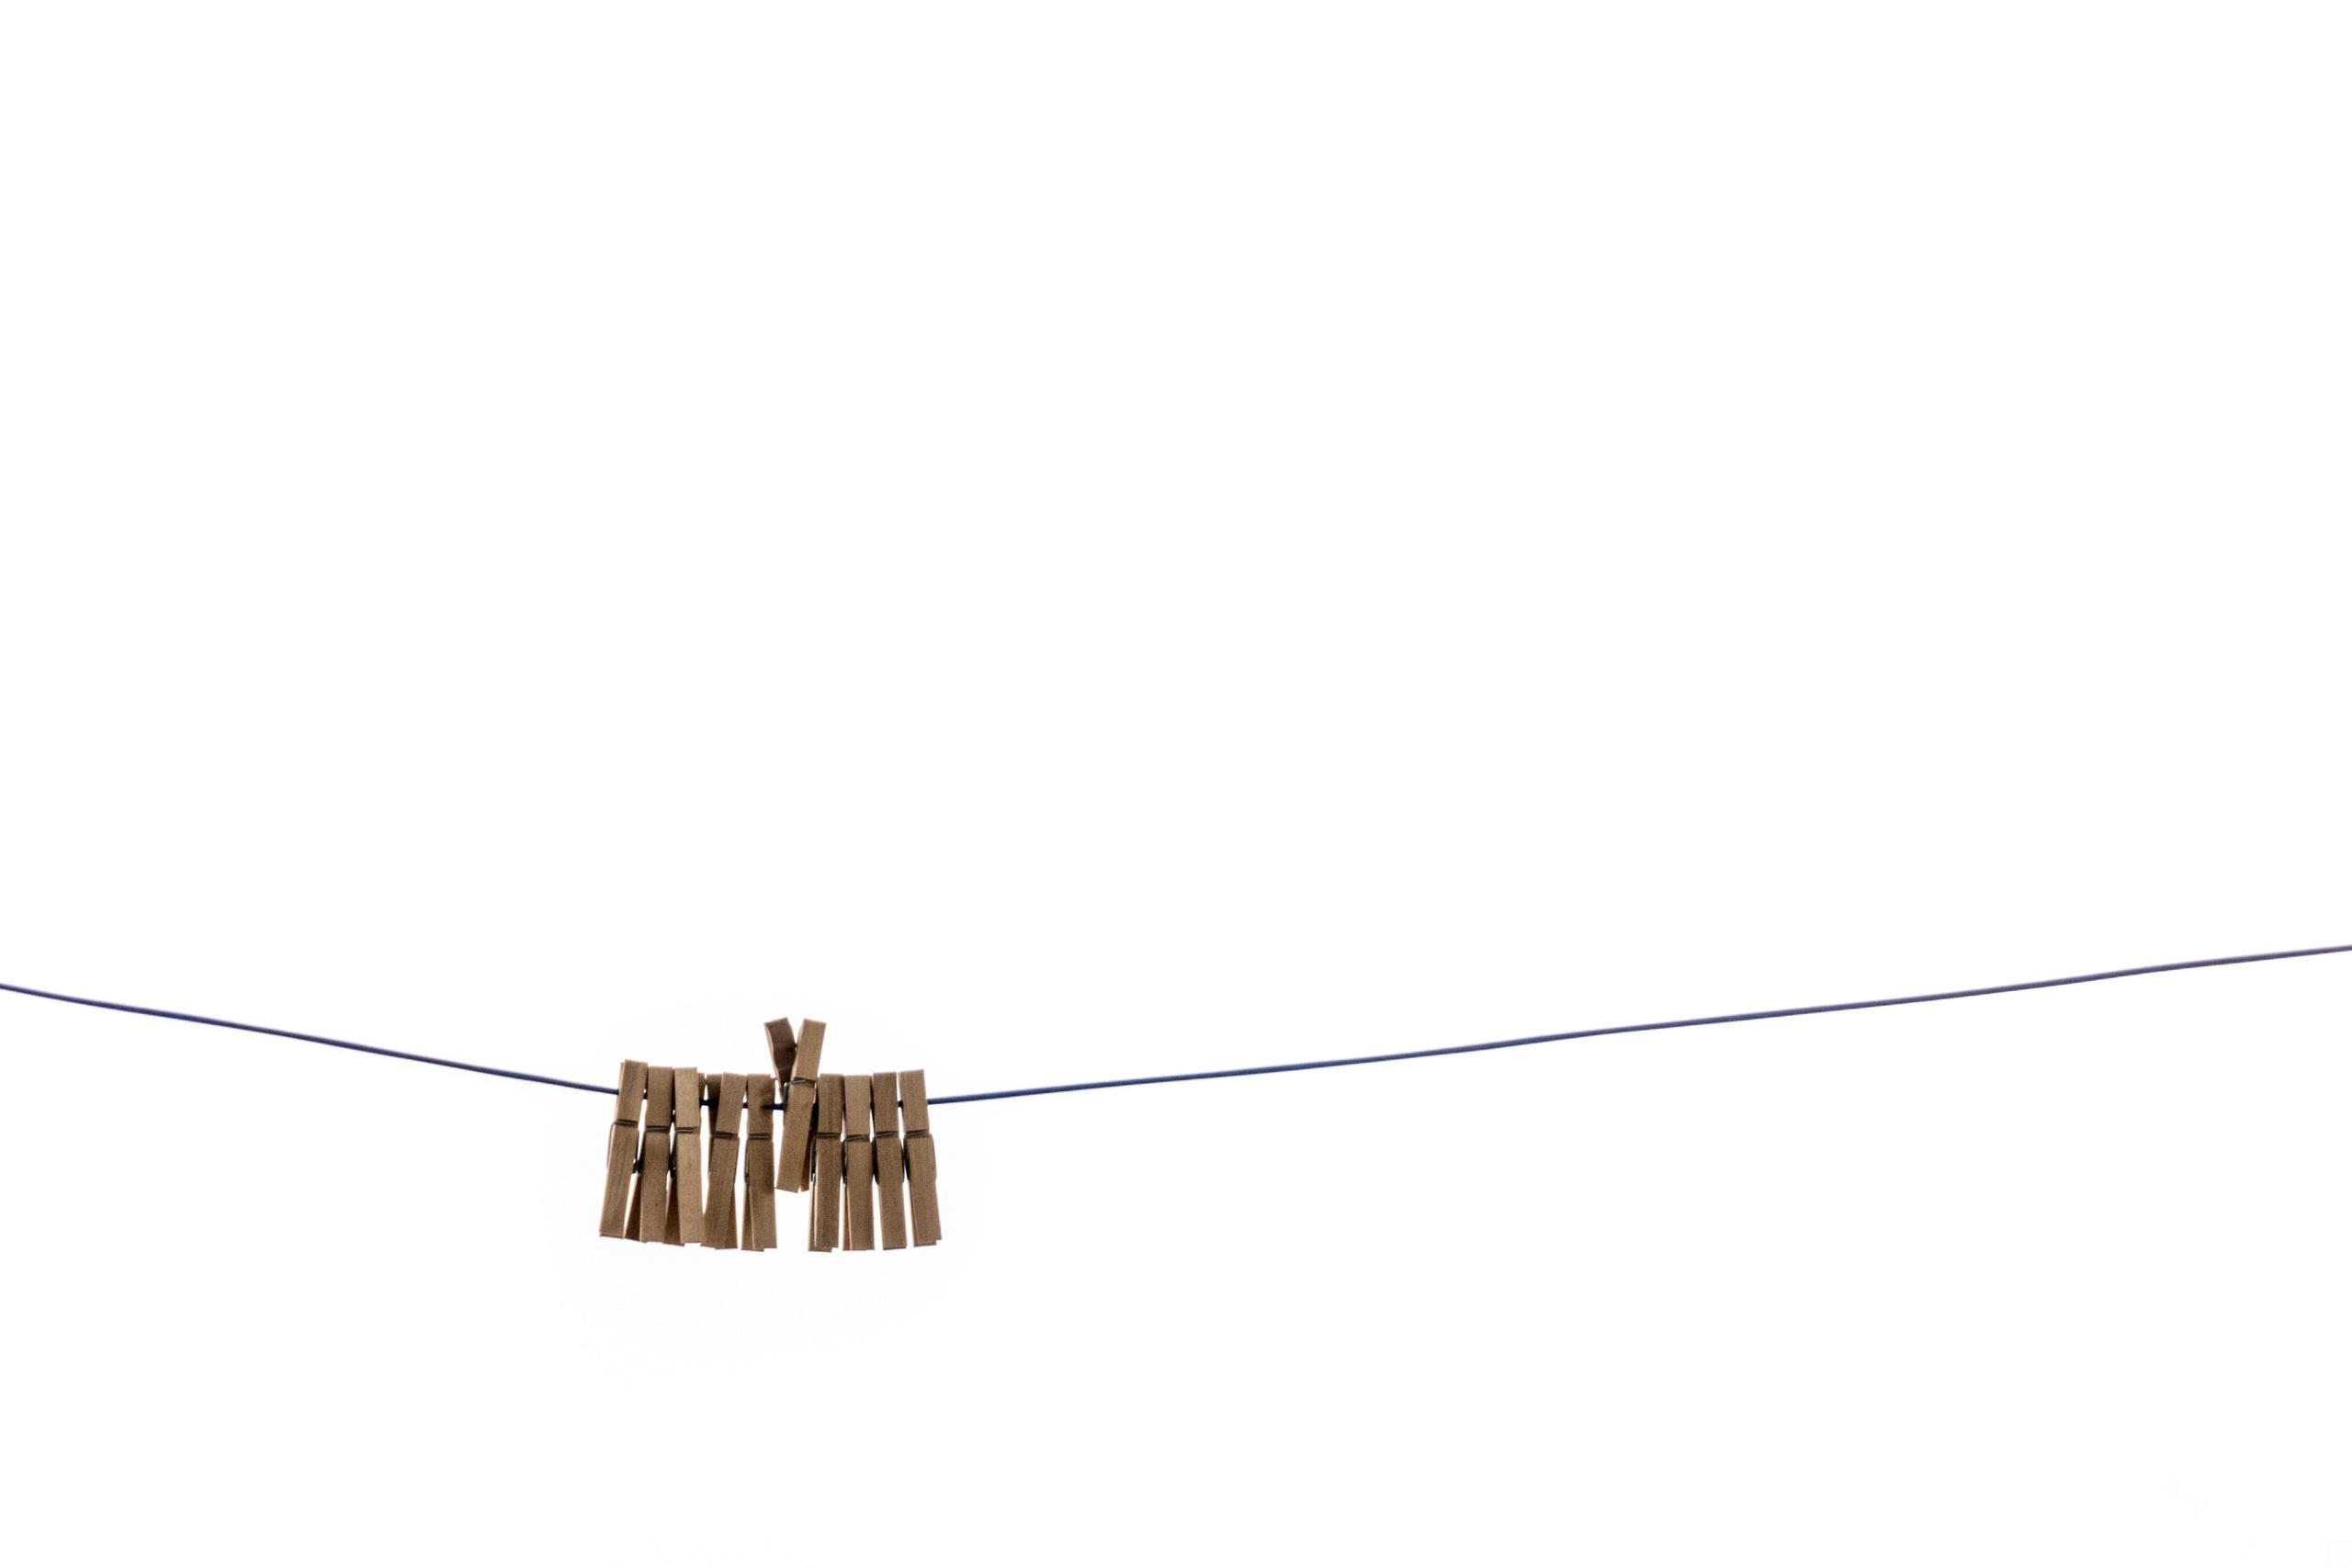 Wallpaper : clothespins, white, minimalism 2560x1707 ...